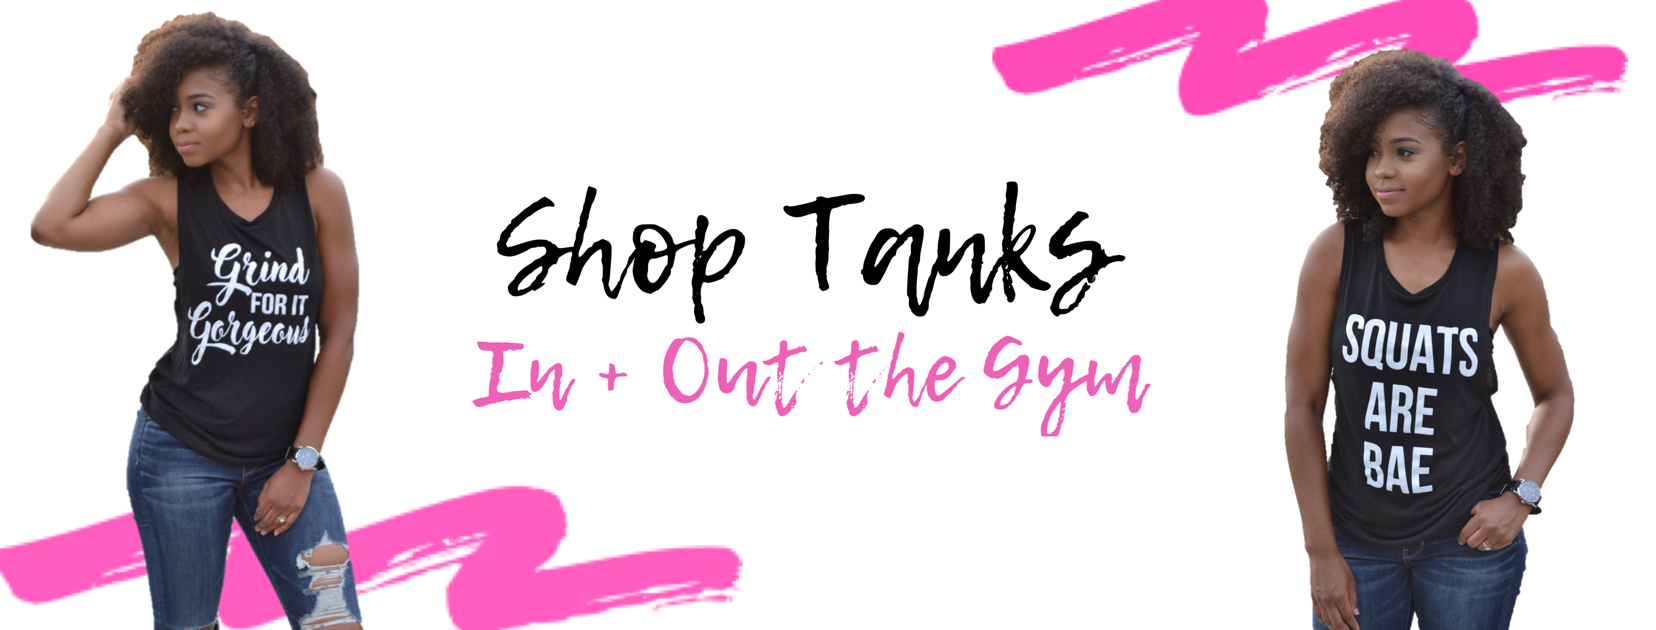 Shop Tanks.png